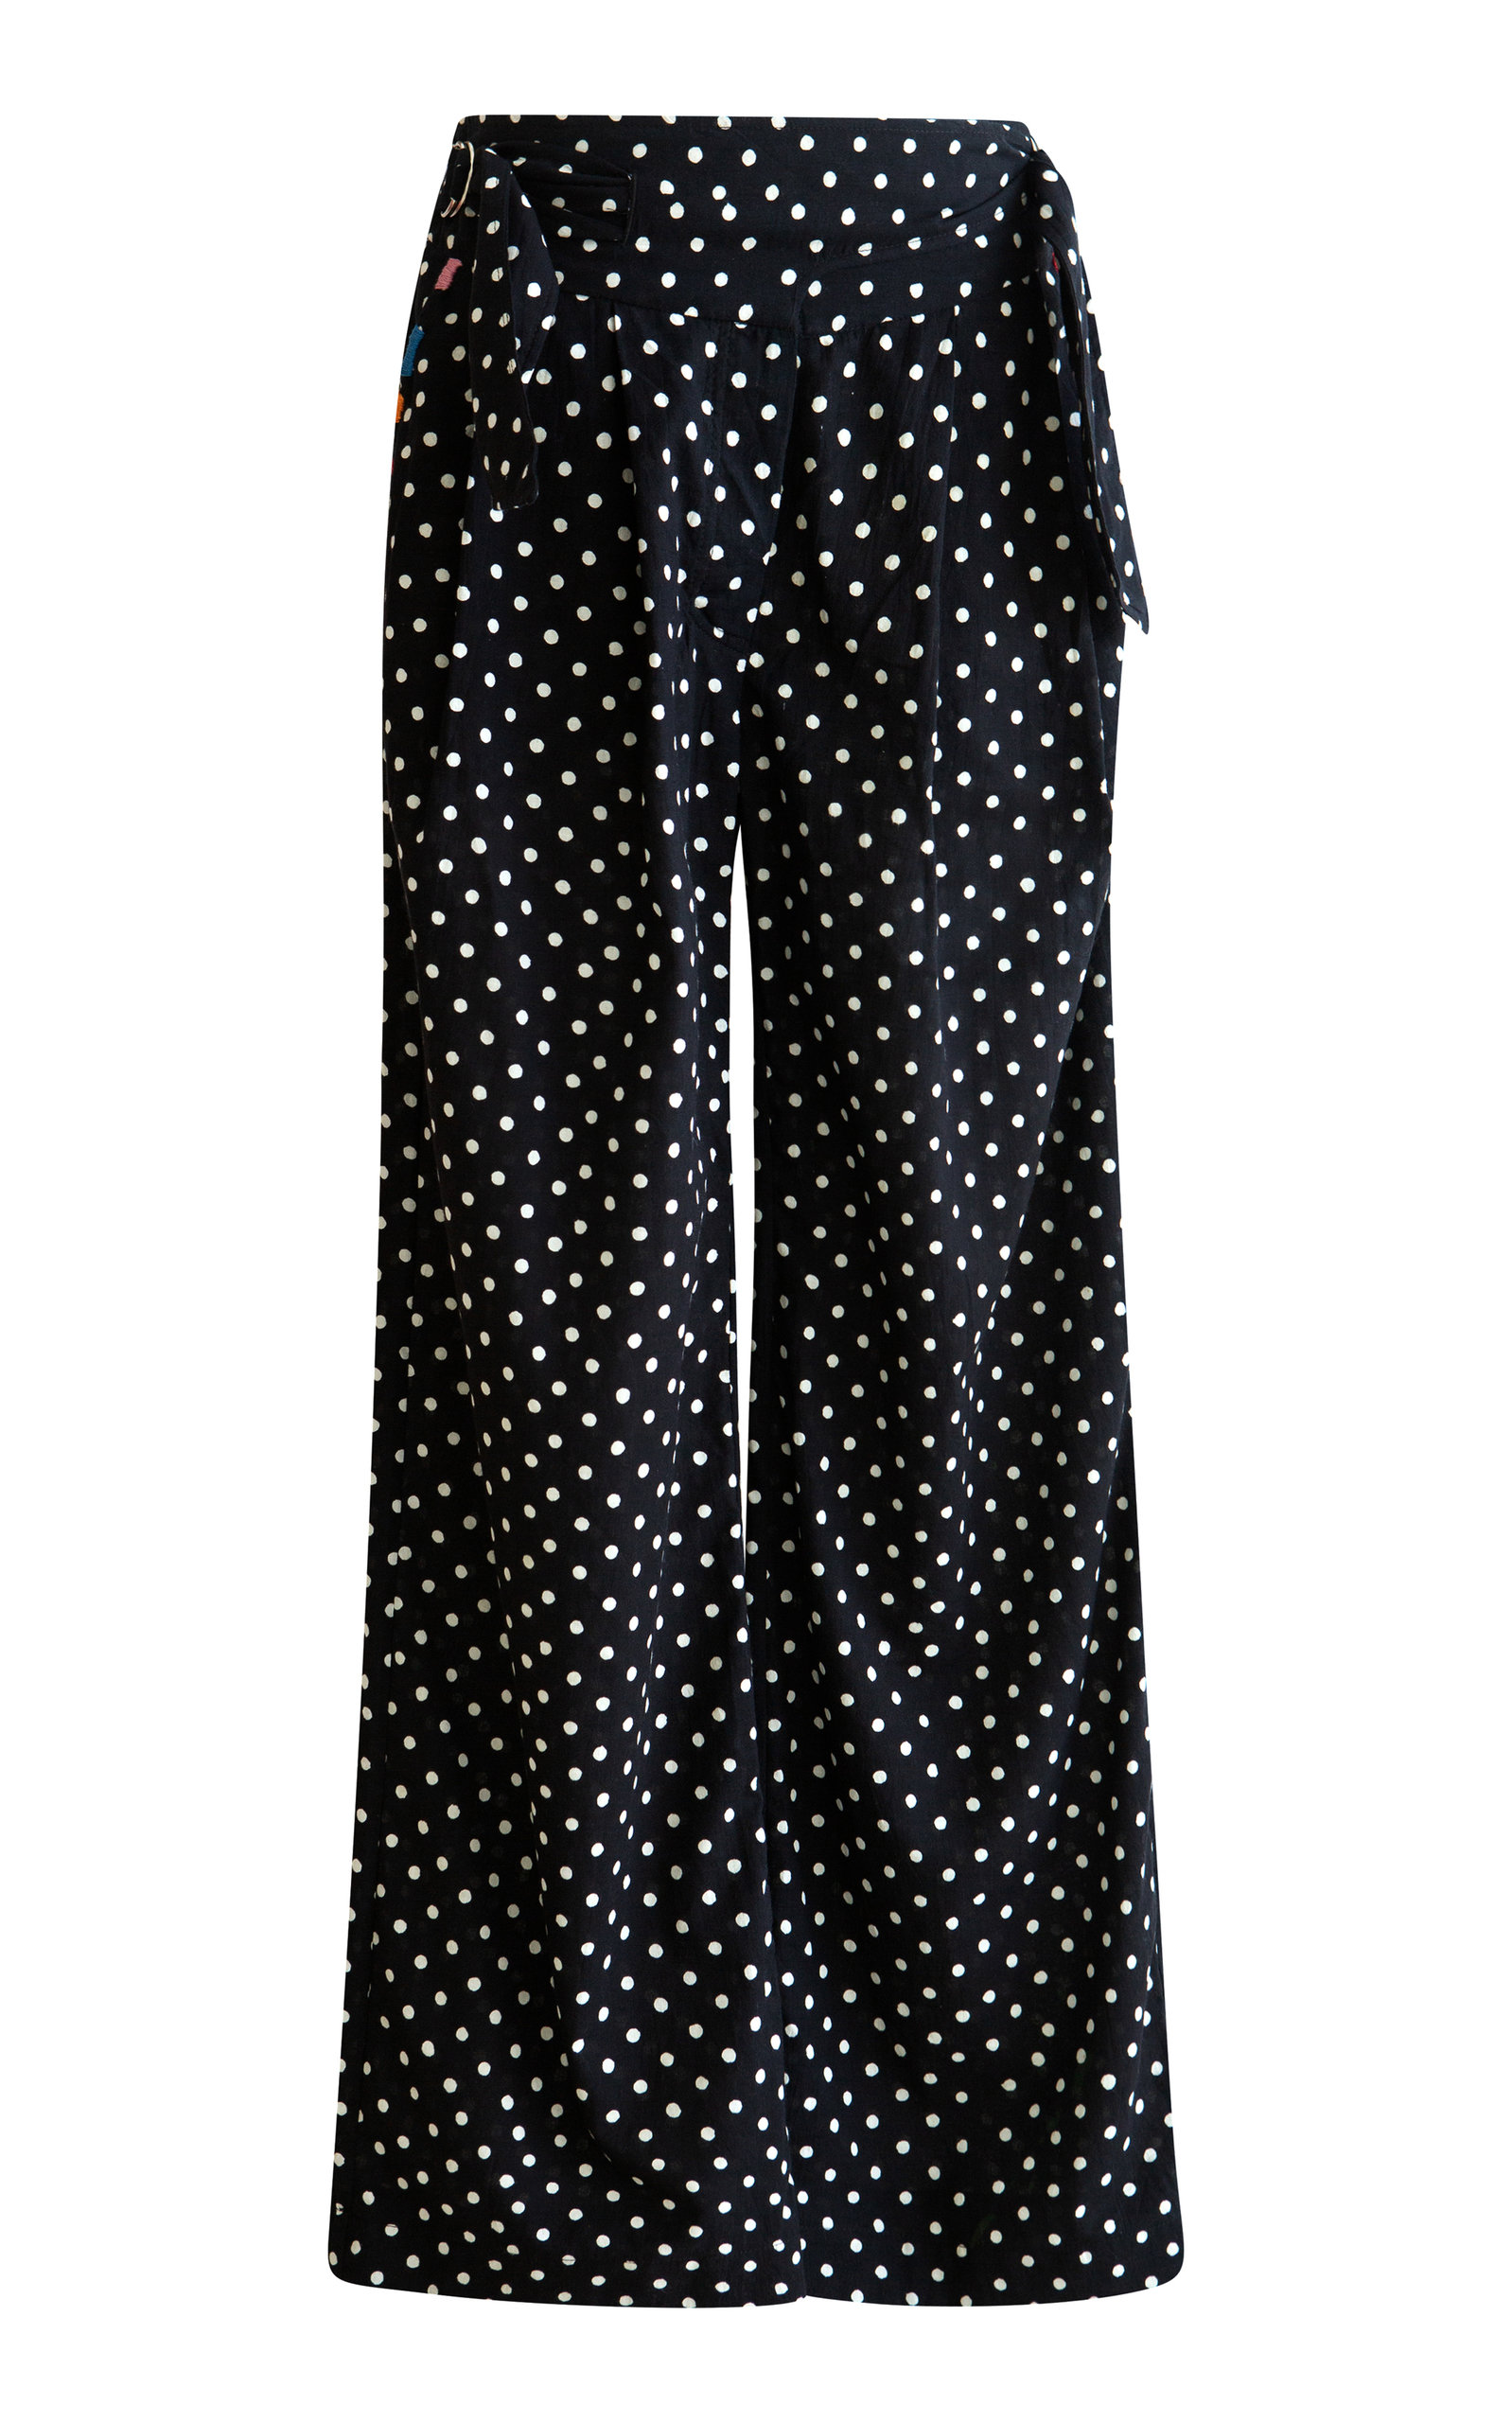 Alix of Bohemia - Women's Painter Dotted Pants - Black/white - Moda Operandi